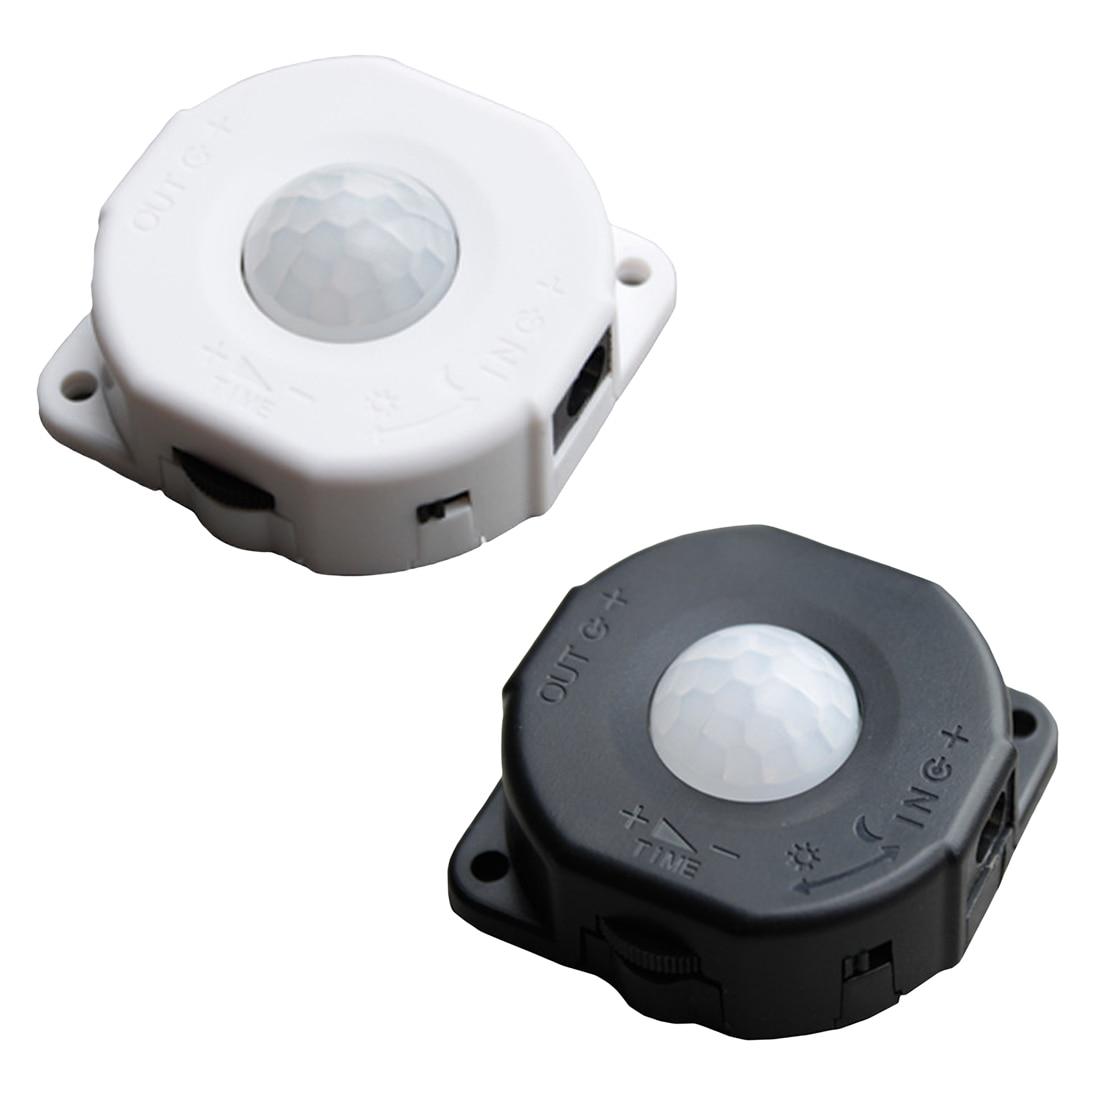 Aliexpress Com Buy New Dc 12v 24v 6a Automatic Infrared